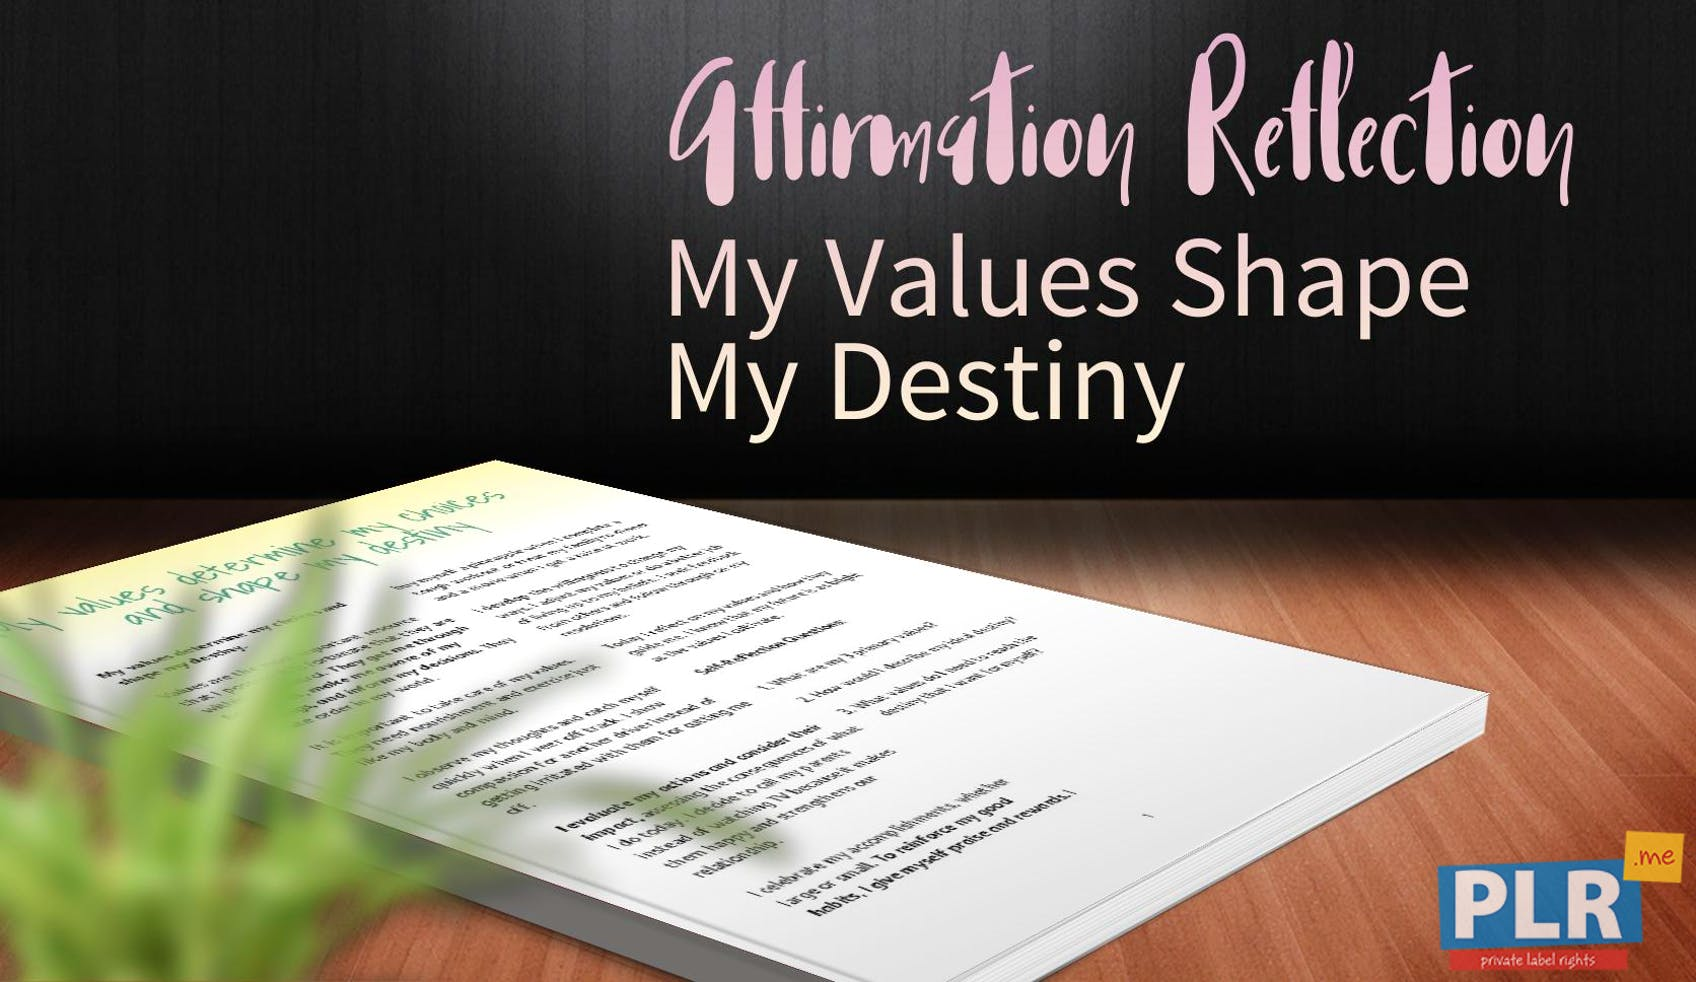 My Values Shape My Destiny